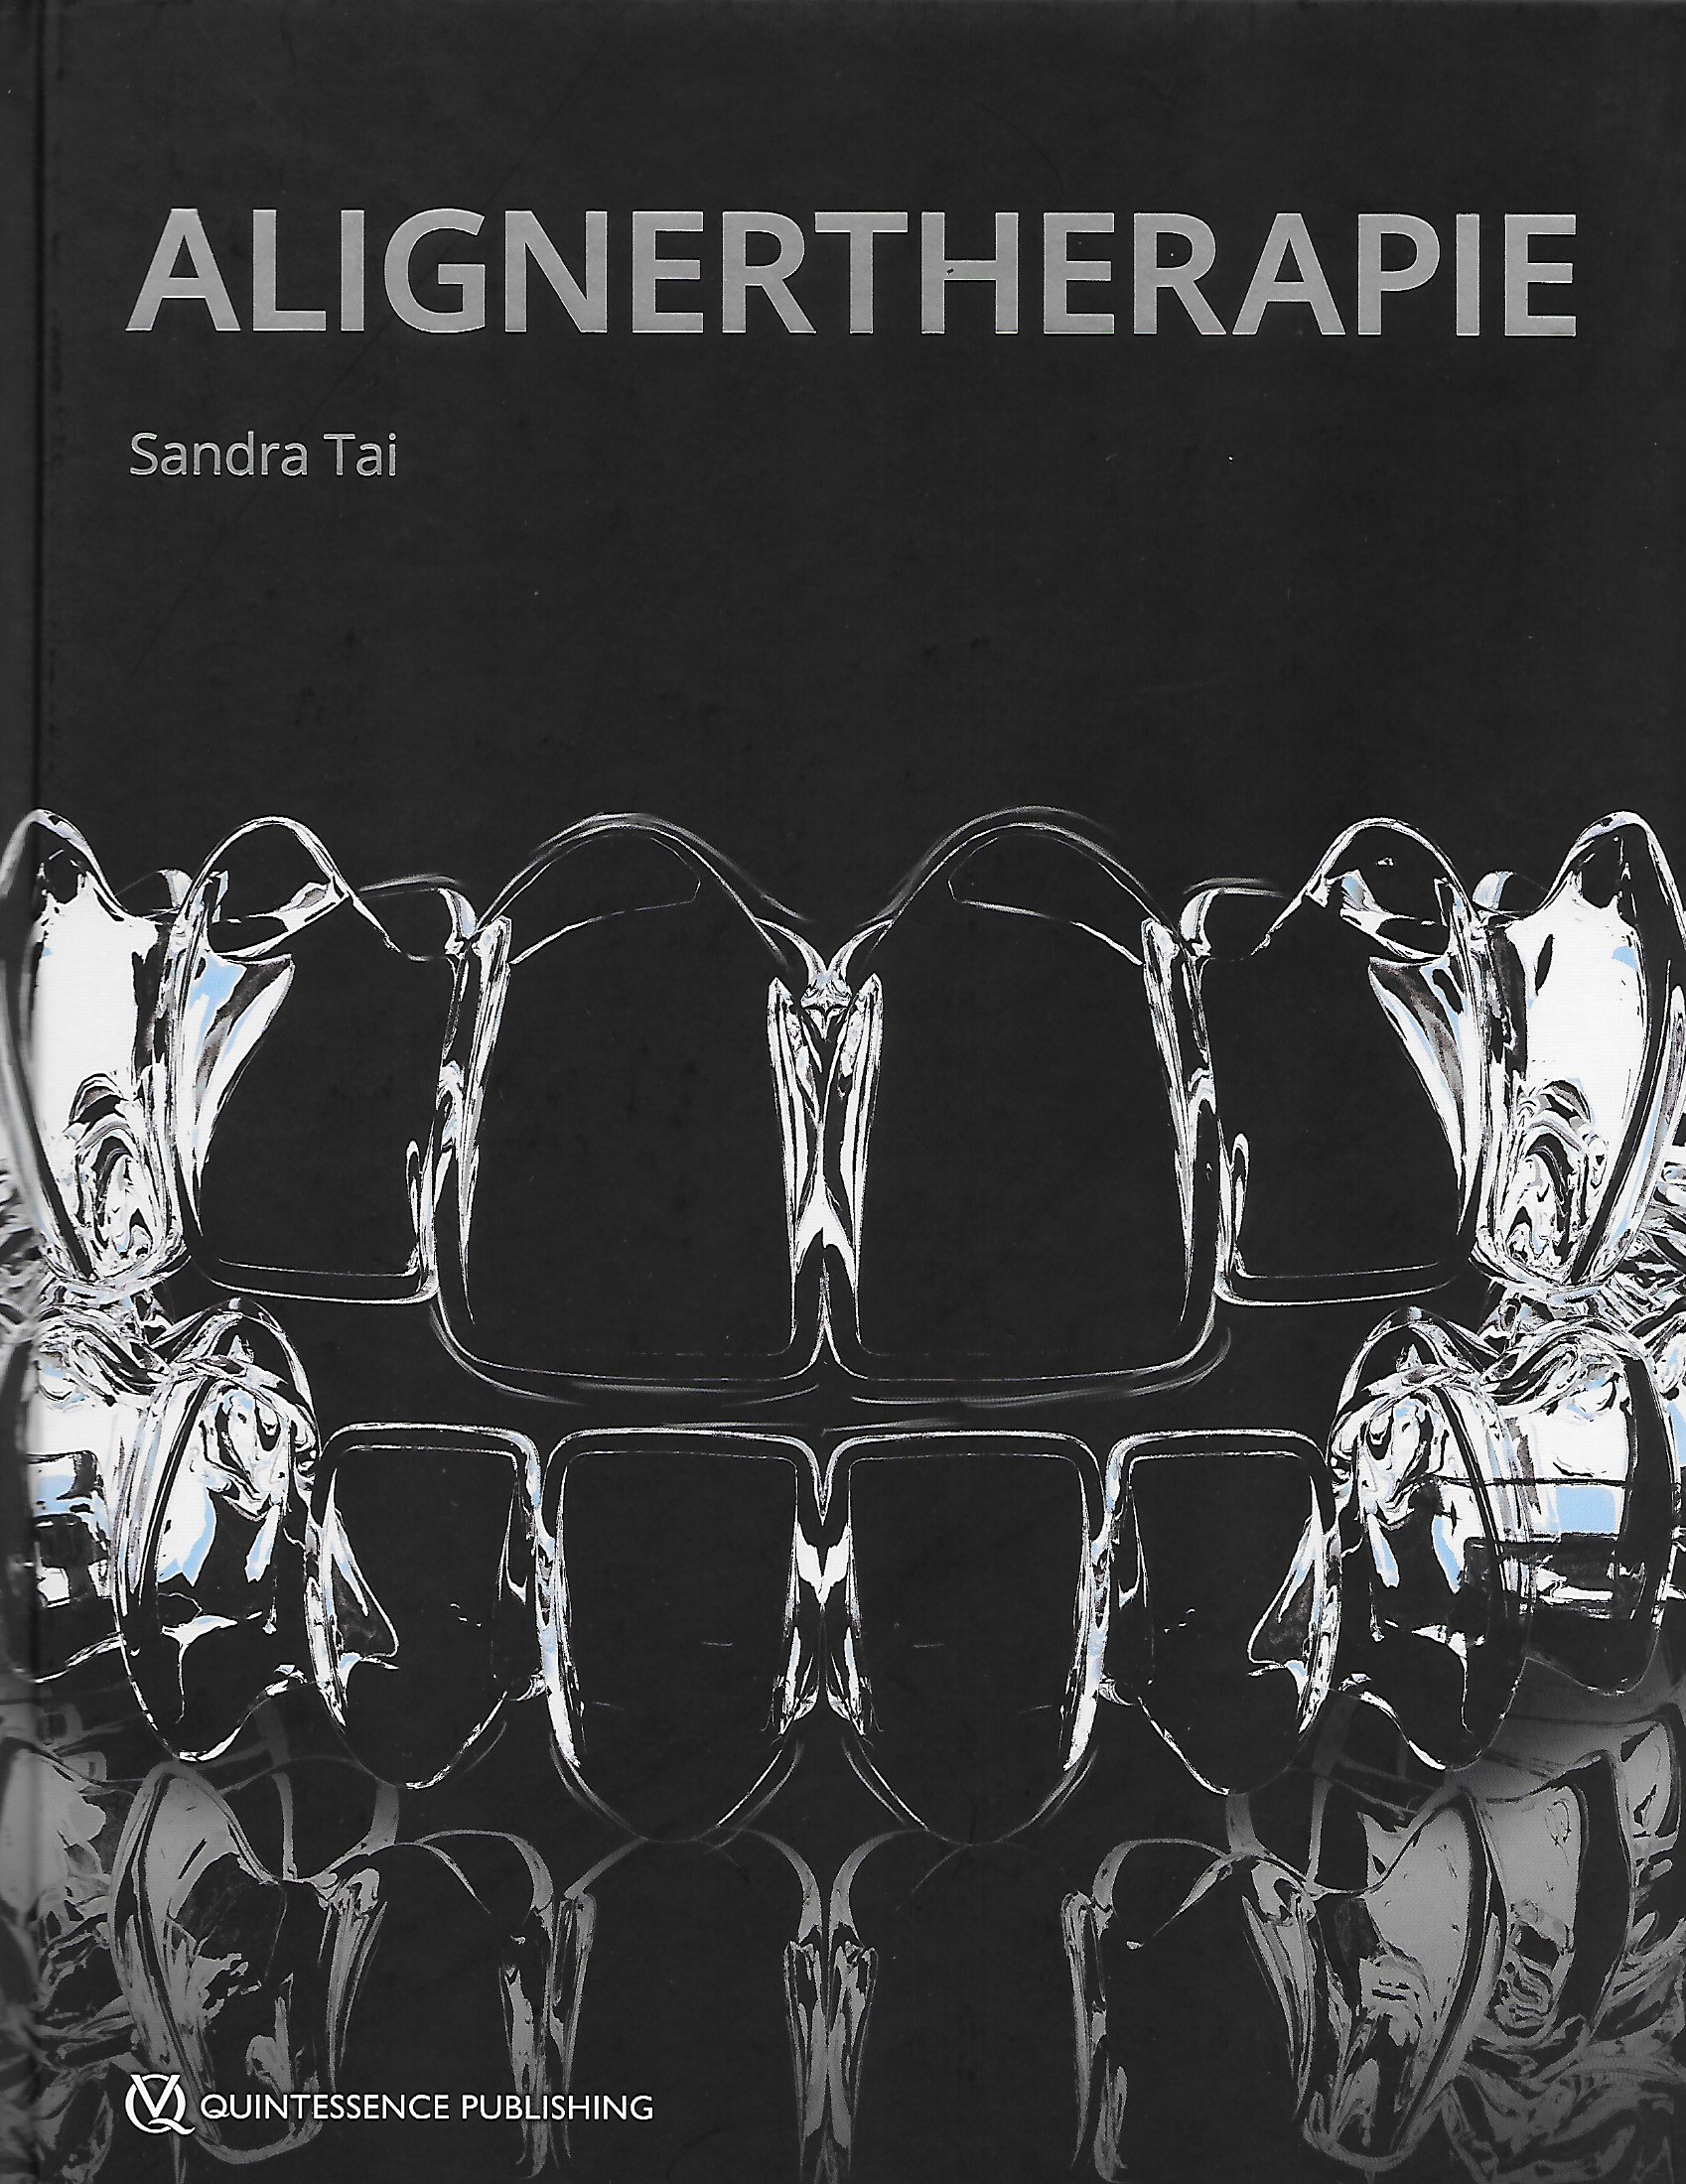 Clear Aligner Technique Book Cover - German